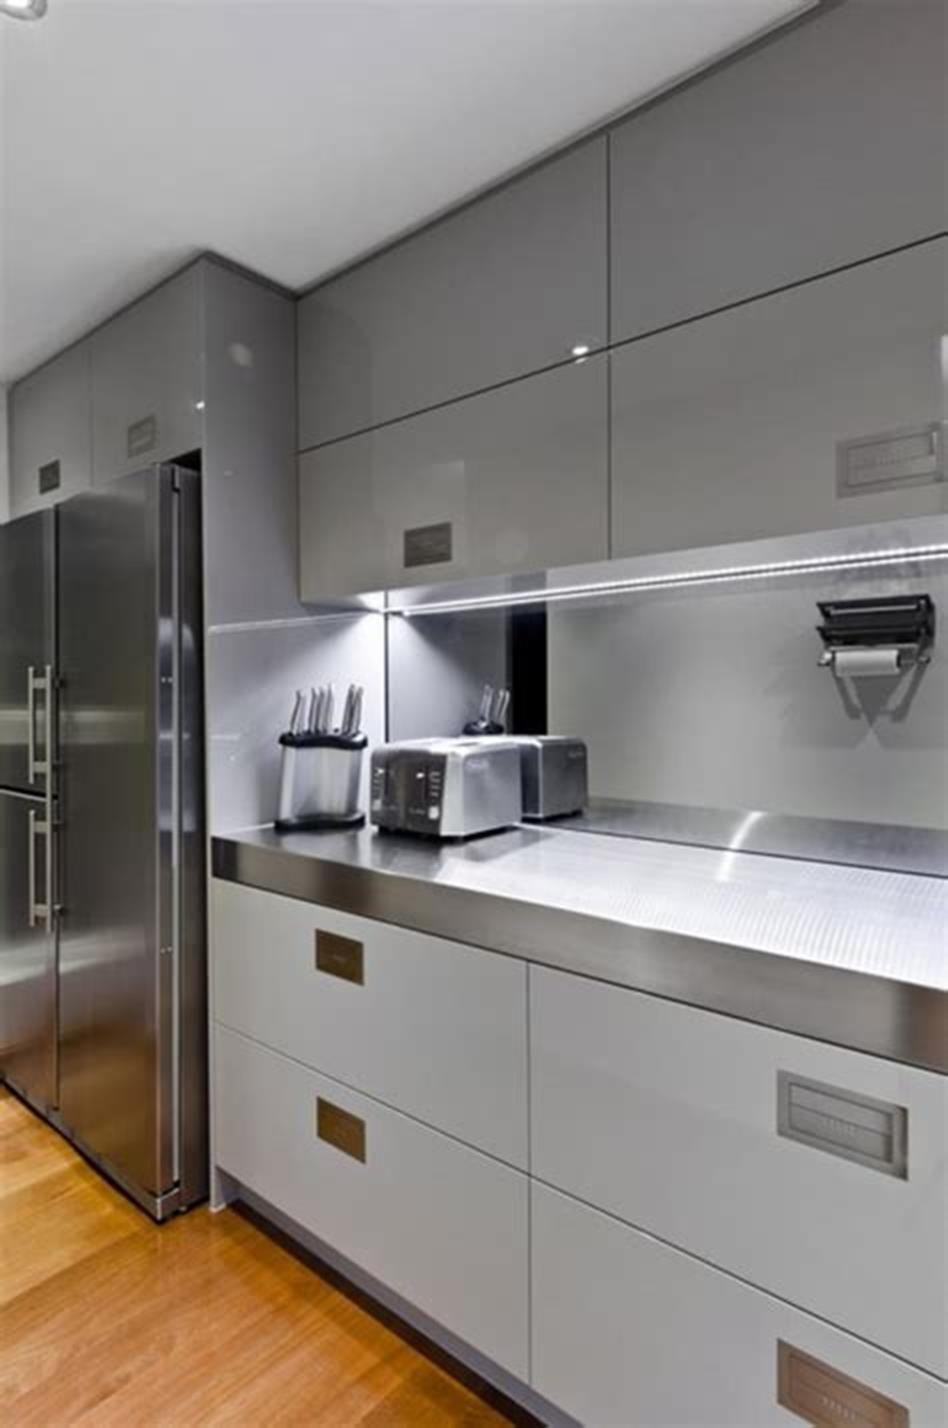 50 Amazing Modern Kitchen Design Ideas For Small Spaces 2019 Homeandcraft Kitchen Inspiration Design Small Modern Kitchens Contemporary Kitchen